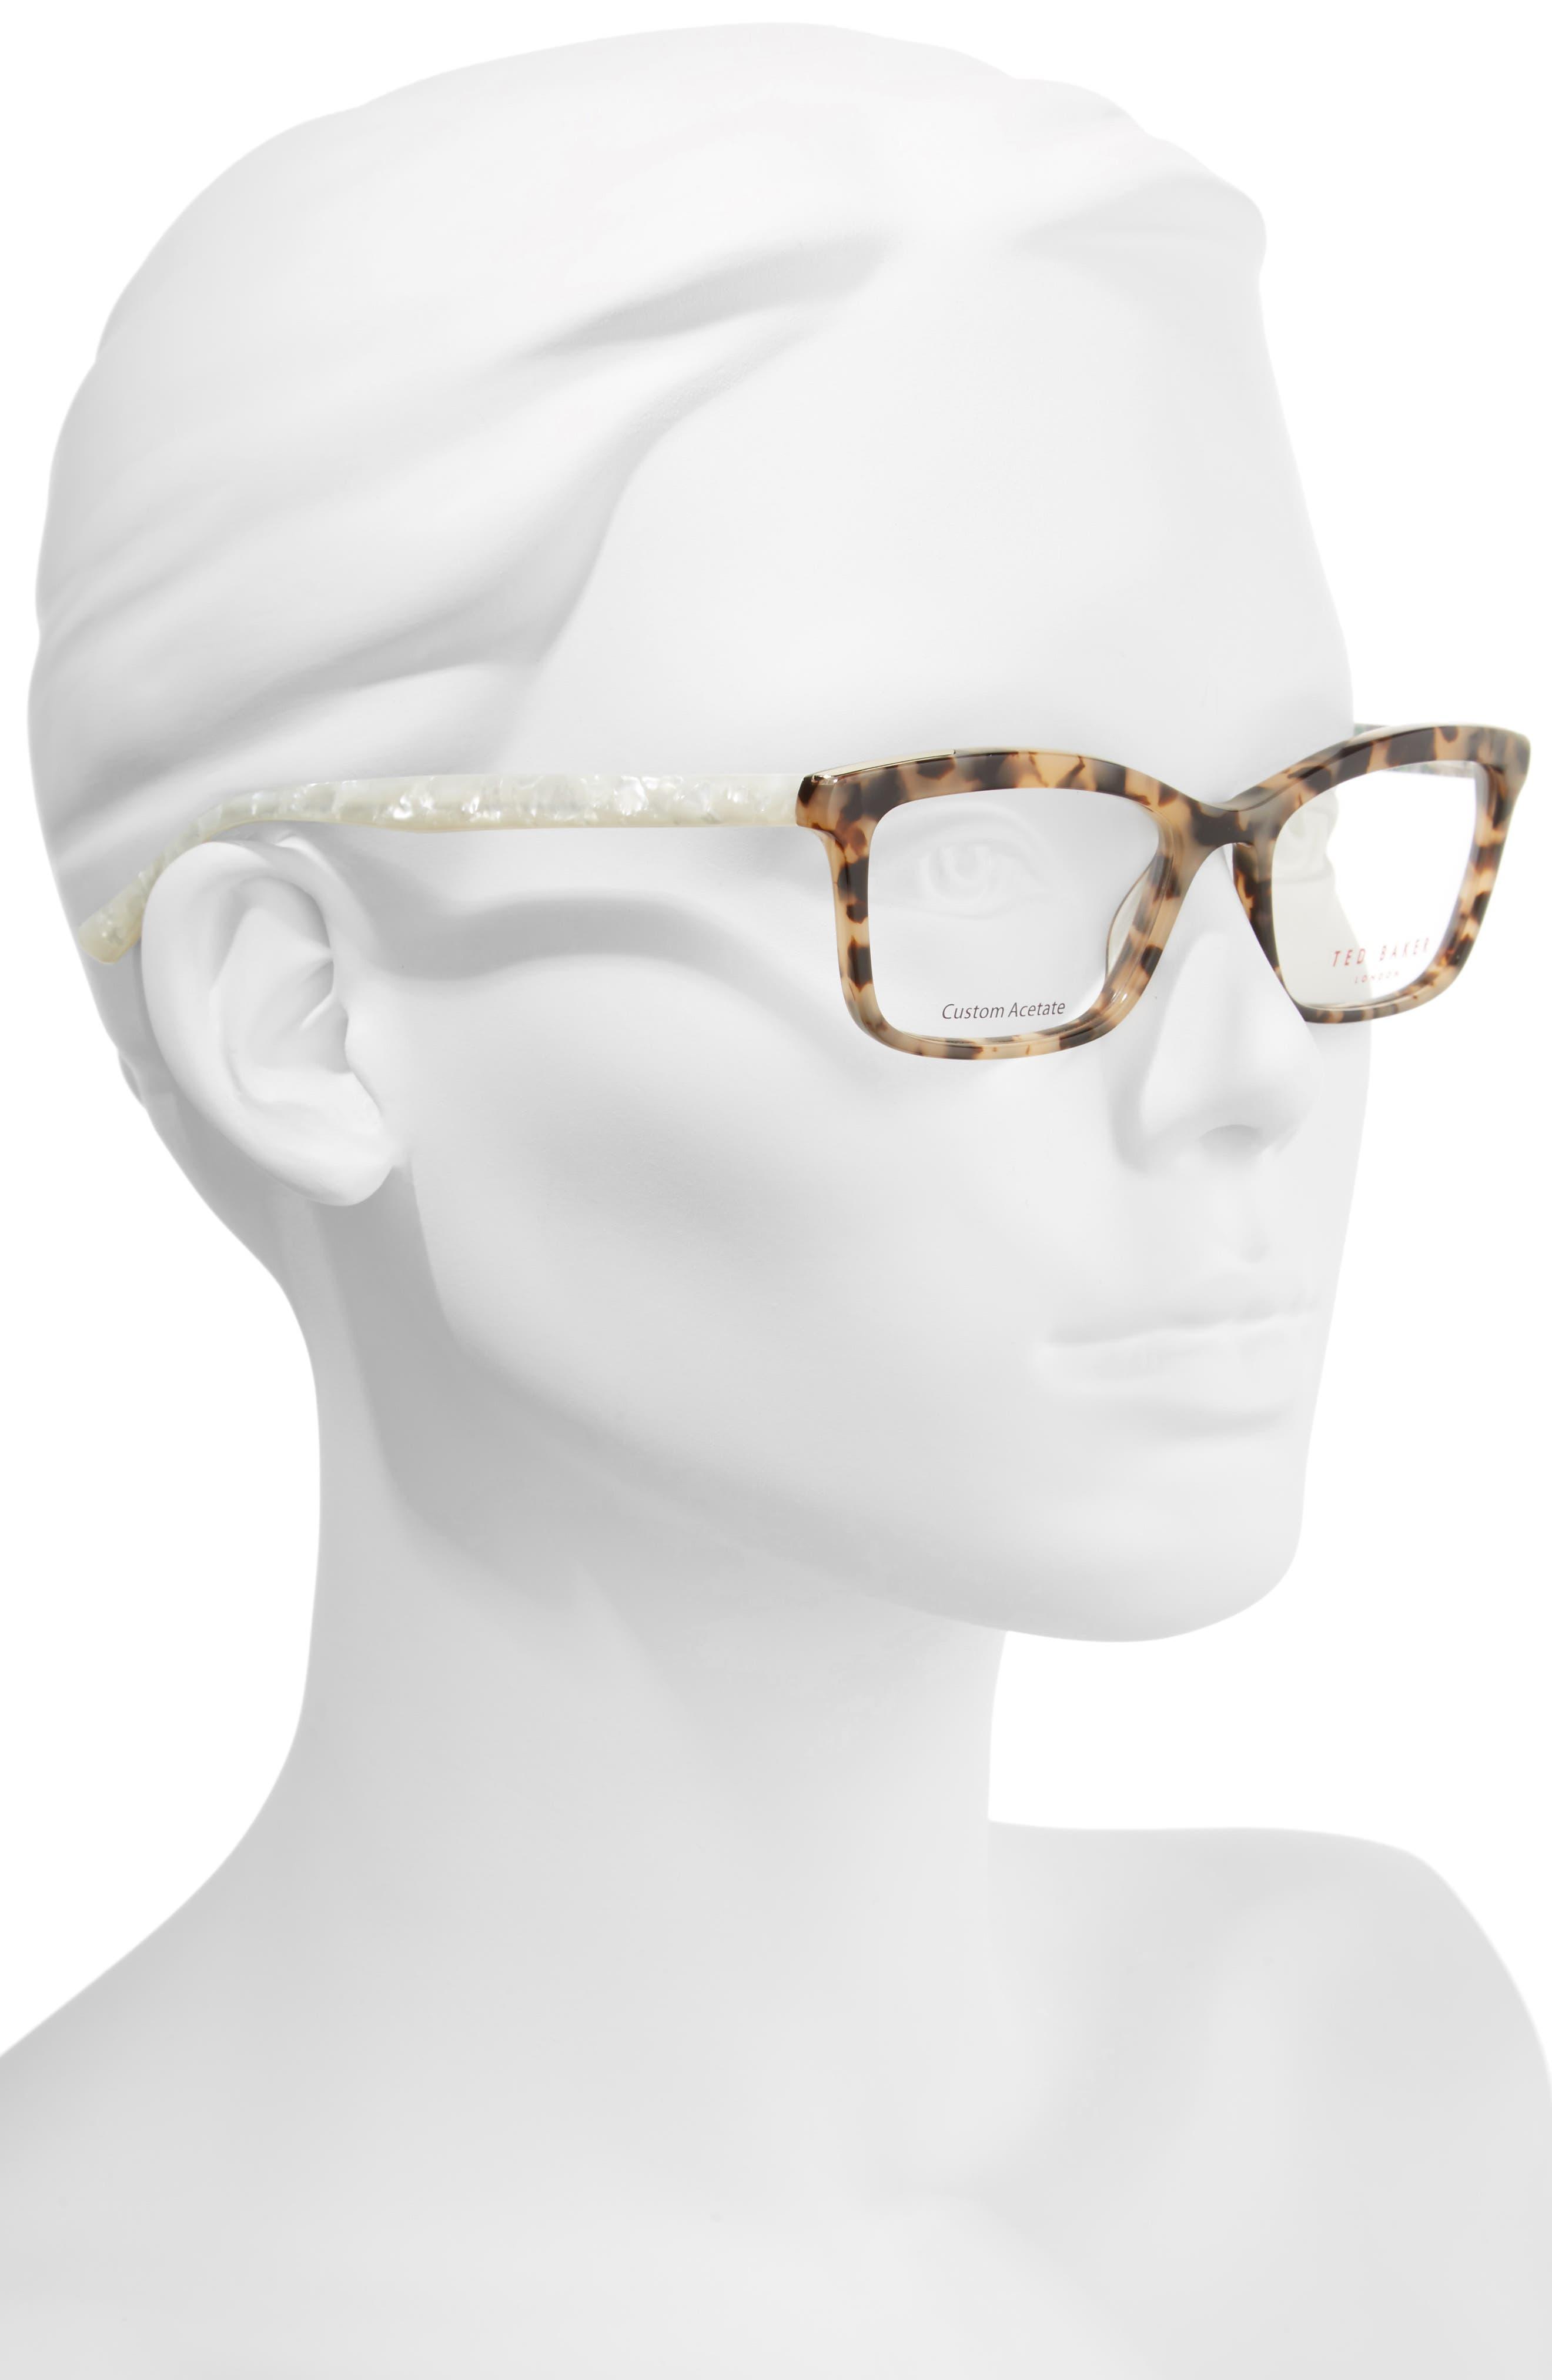 52mm Optical Glasses,                             Alternate thumbnail 2, color,                             200